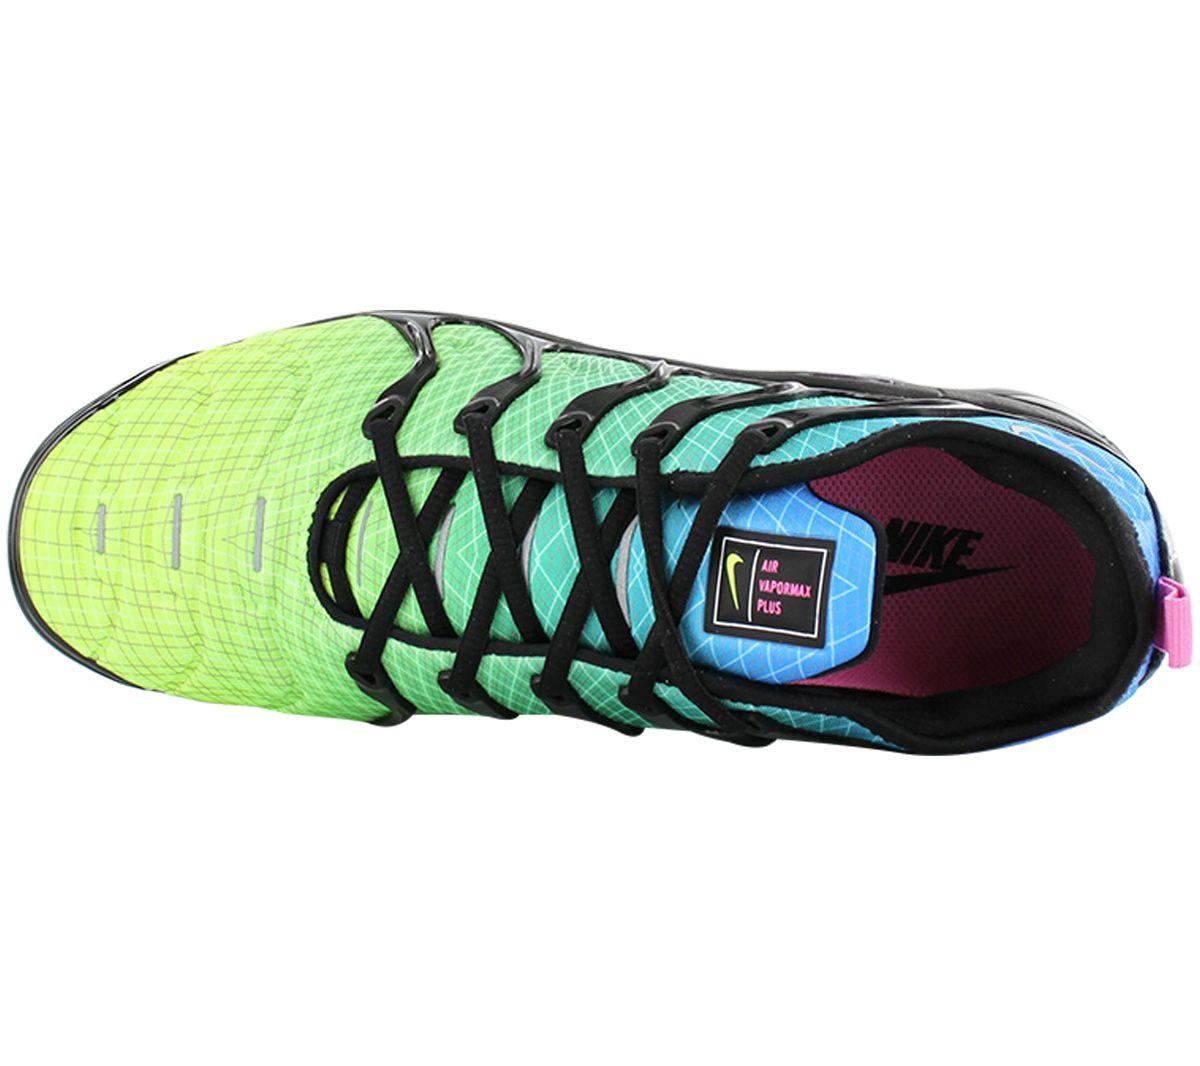 Details zu Nike Air VaporMax Plus TN Aurora 924453 302 Herren Sneaker Schuhe Turnschuhe